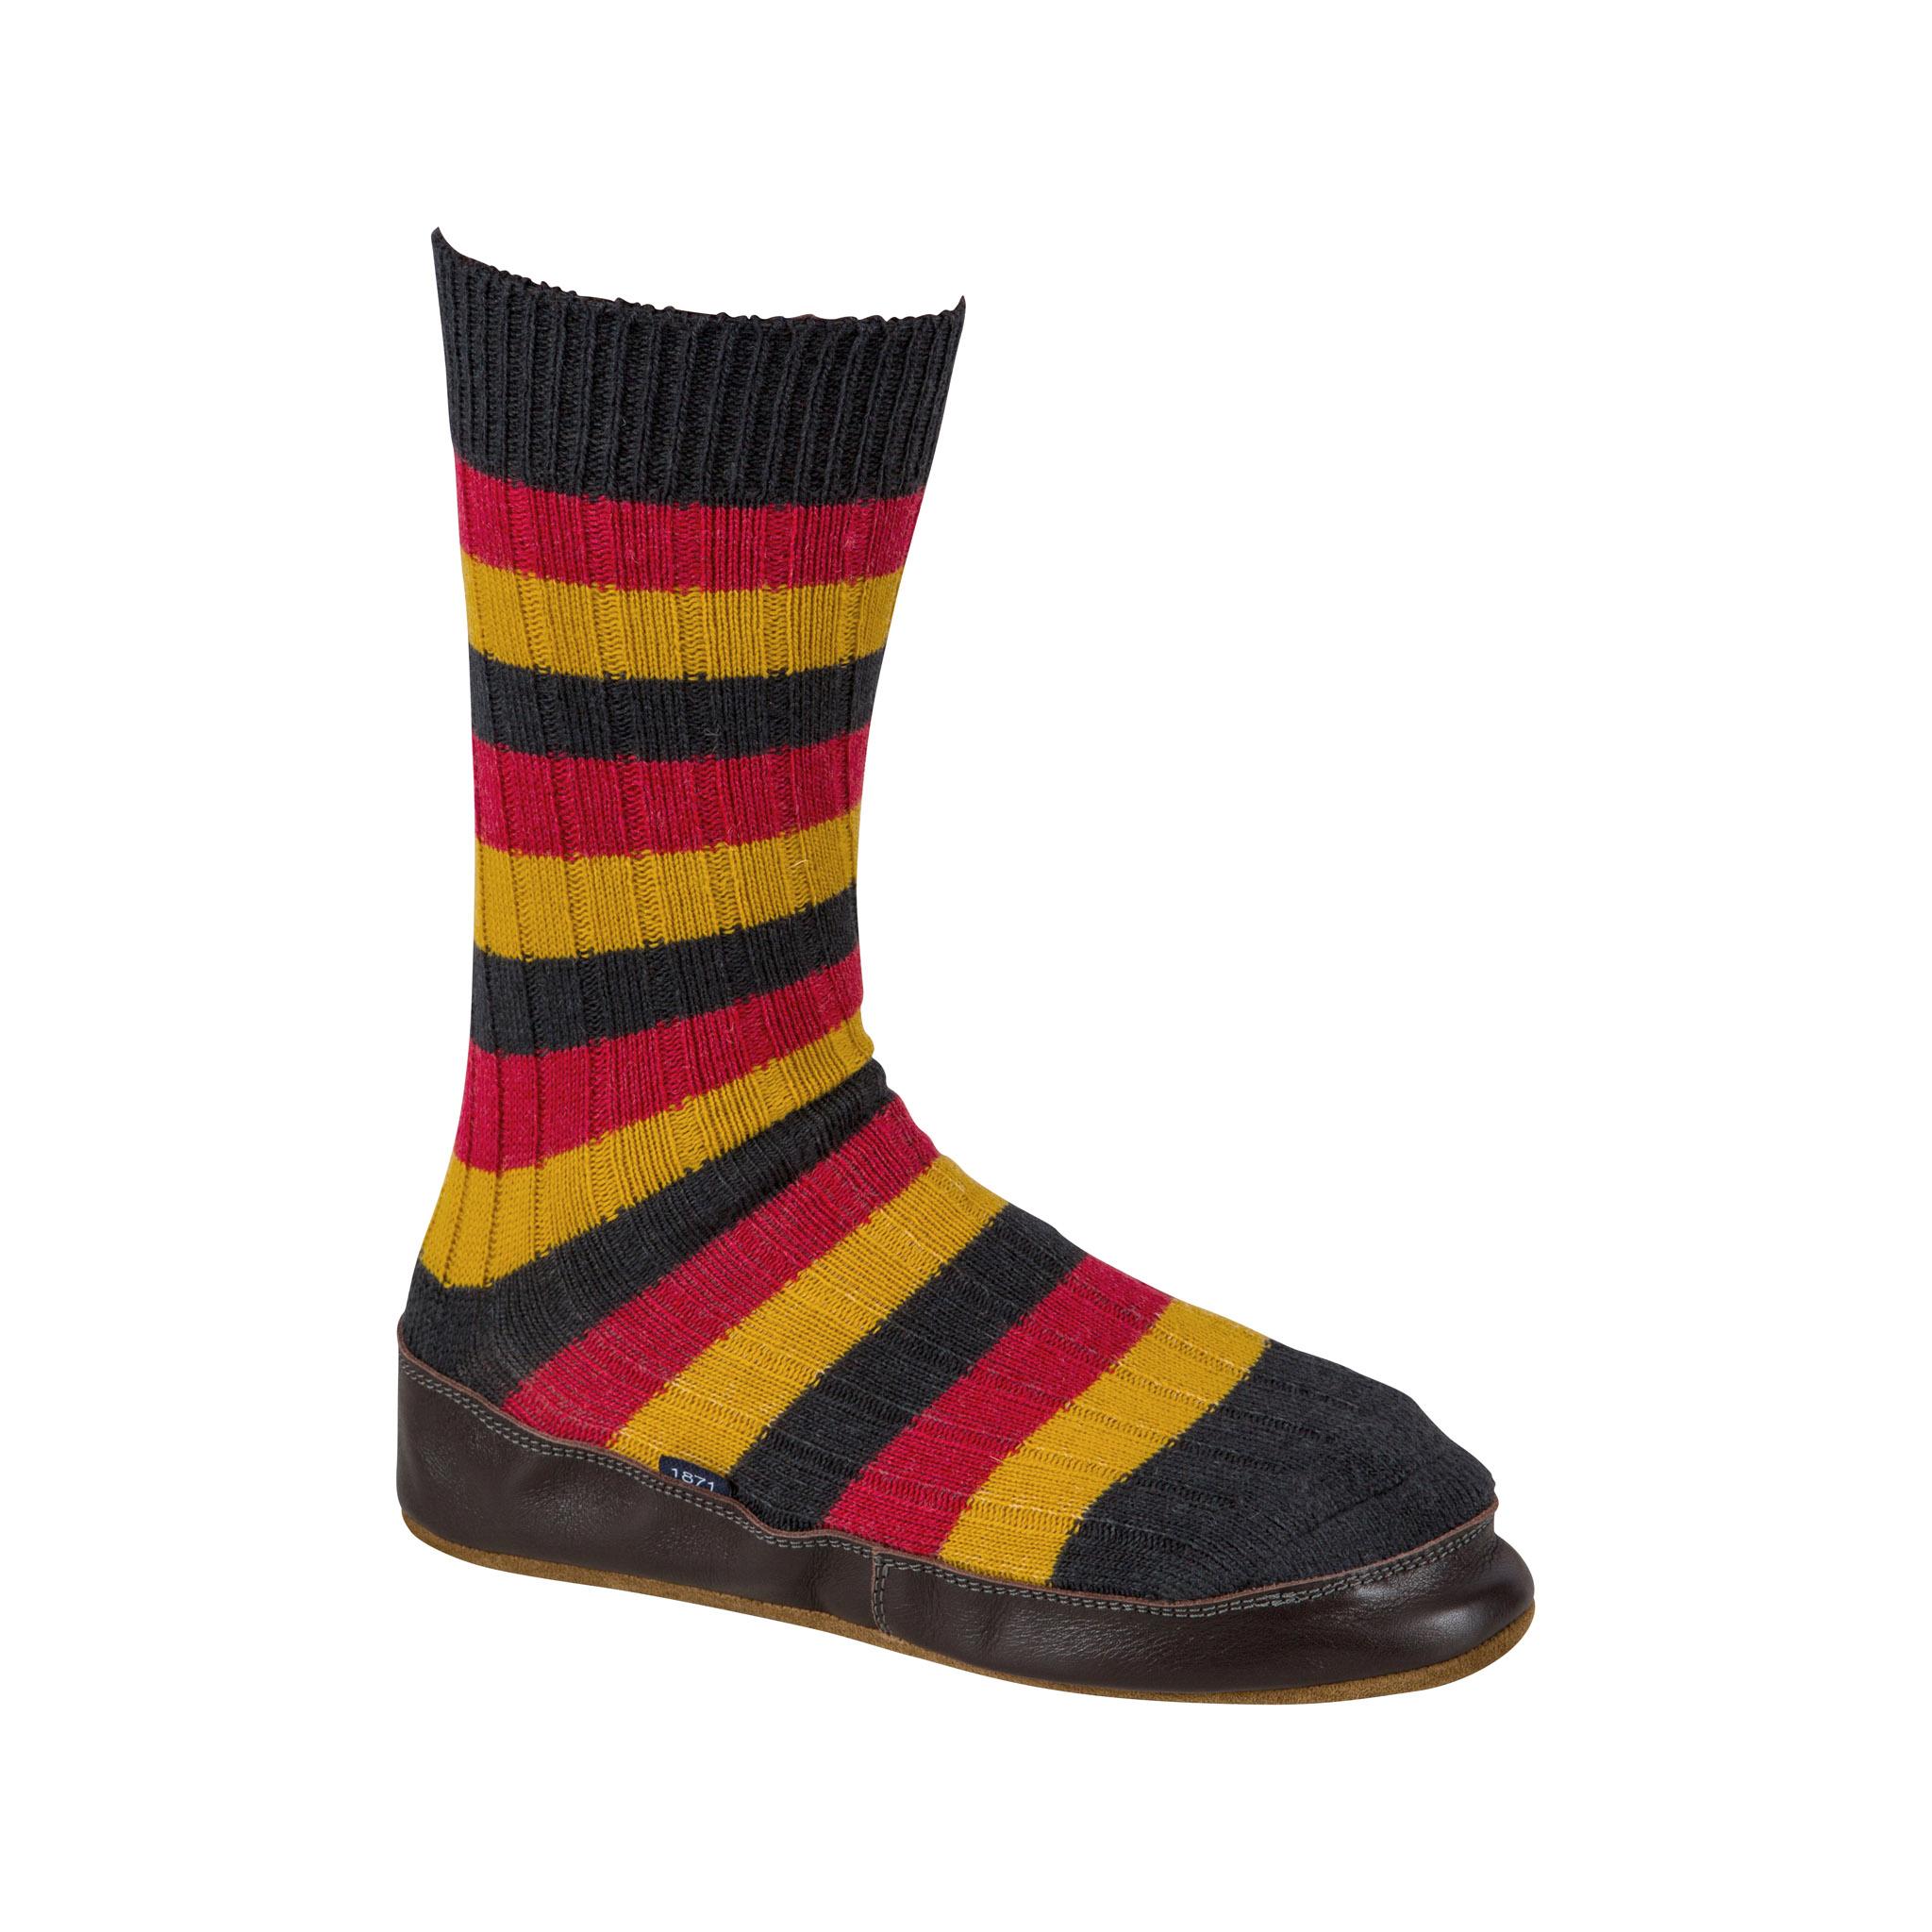 Slipper Sock blue and mustard stripe